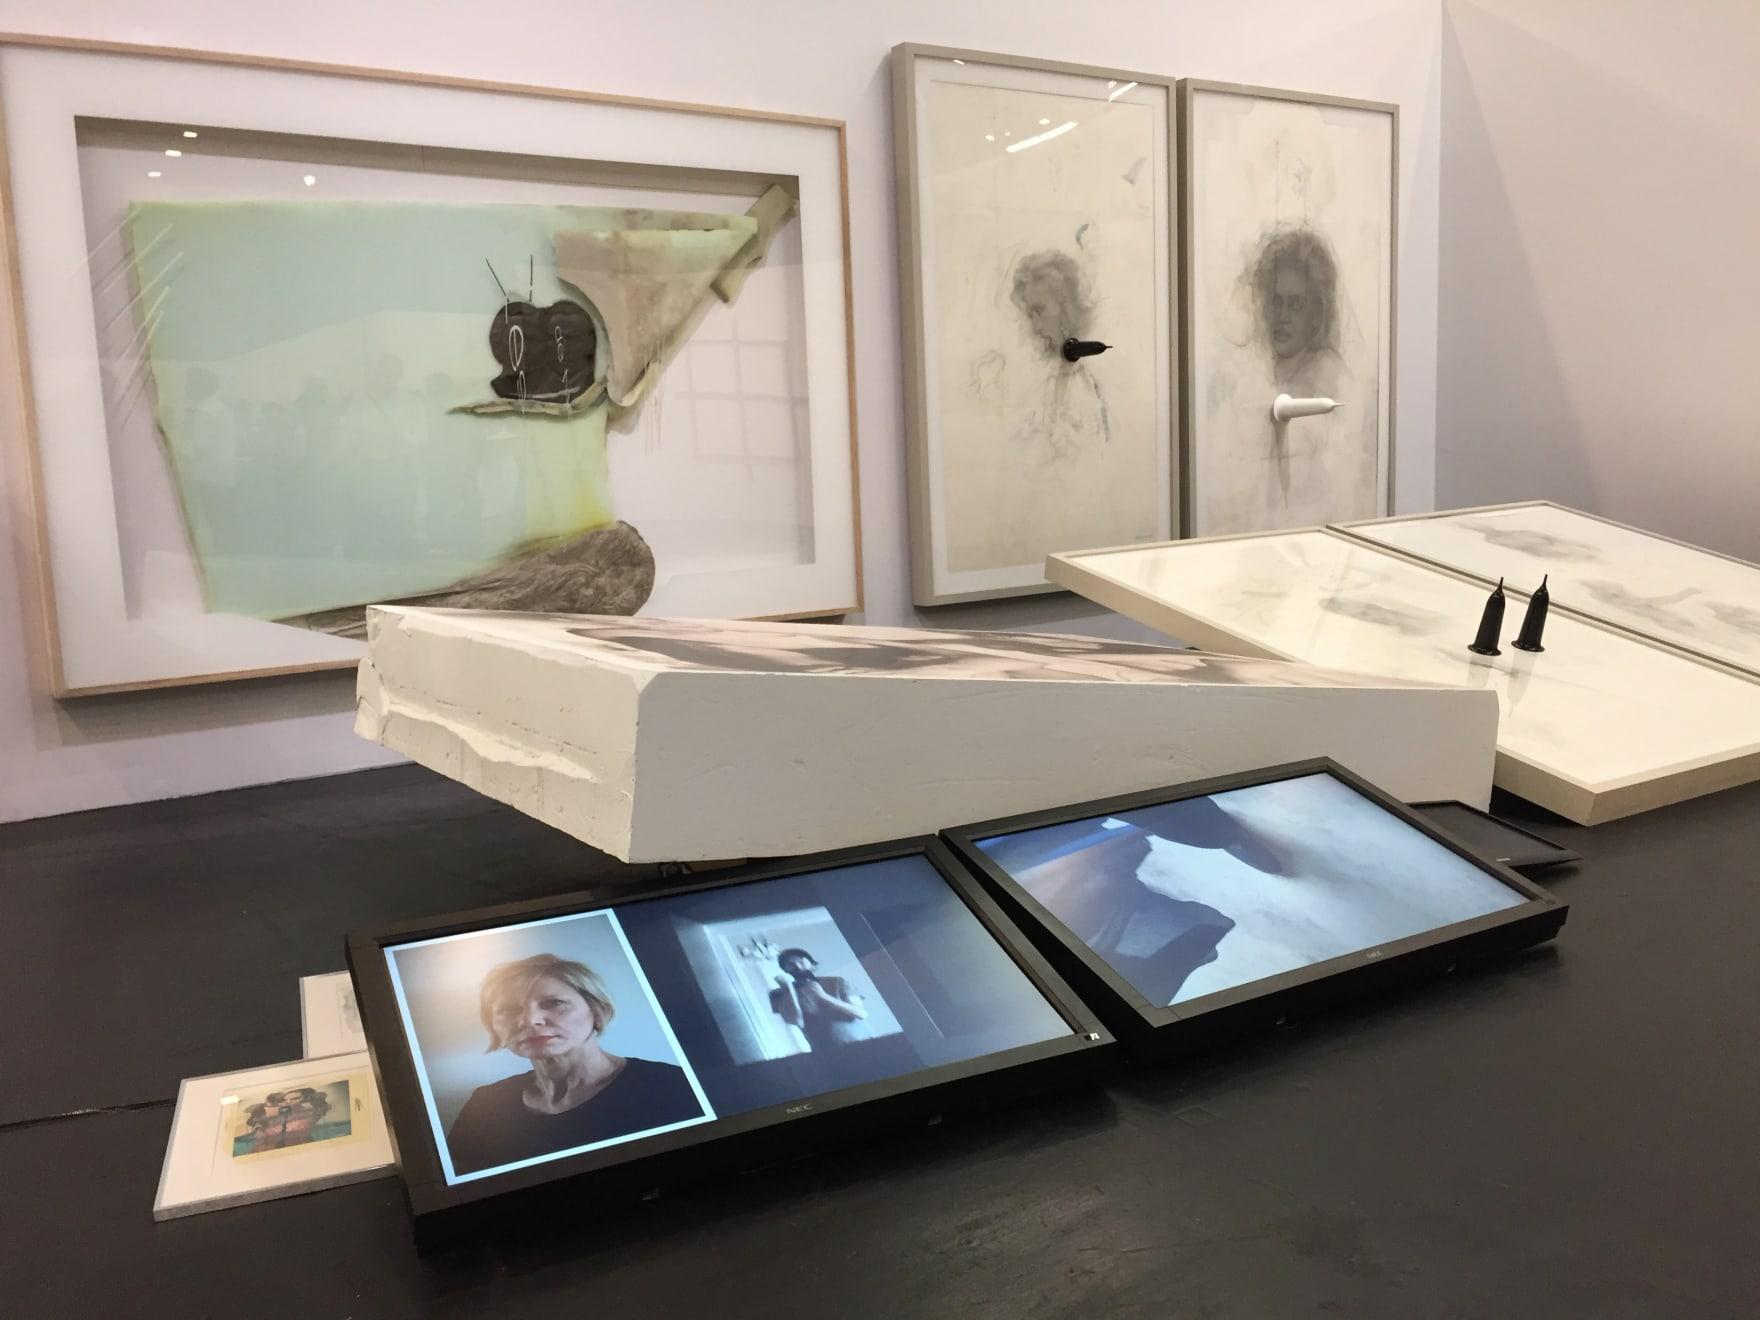 Art Cologne 2018 / Code Art Fair, Copenhagen 2017 Solo exhibitions presented by Galerija VARTAI